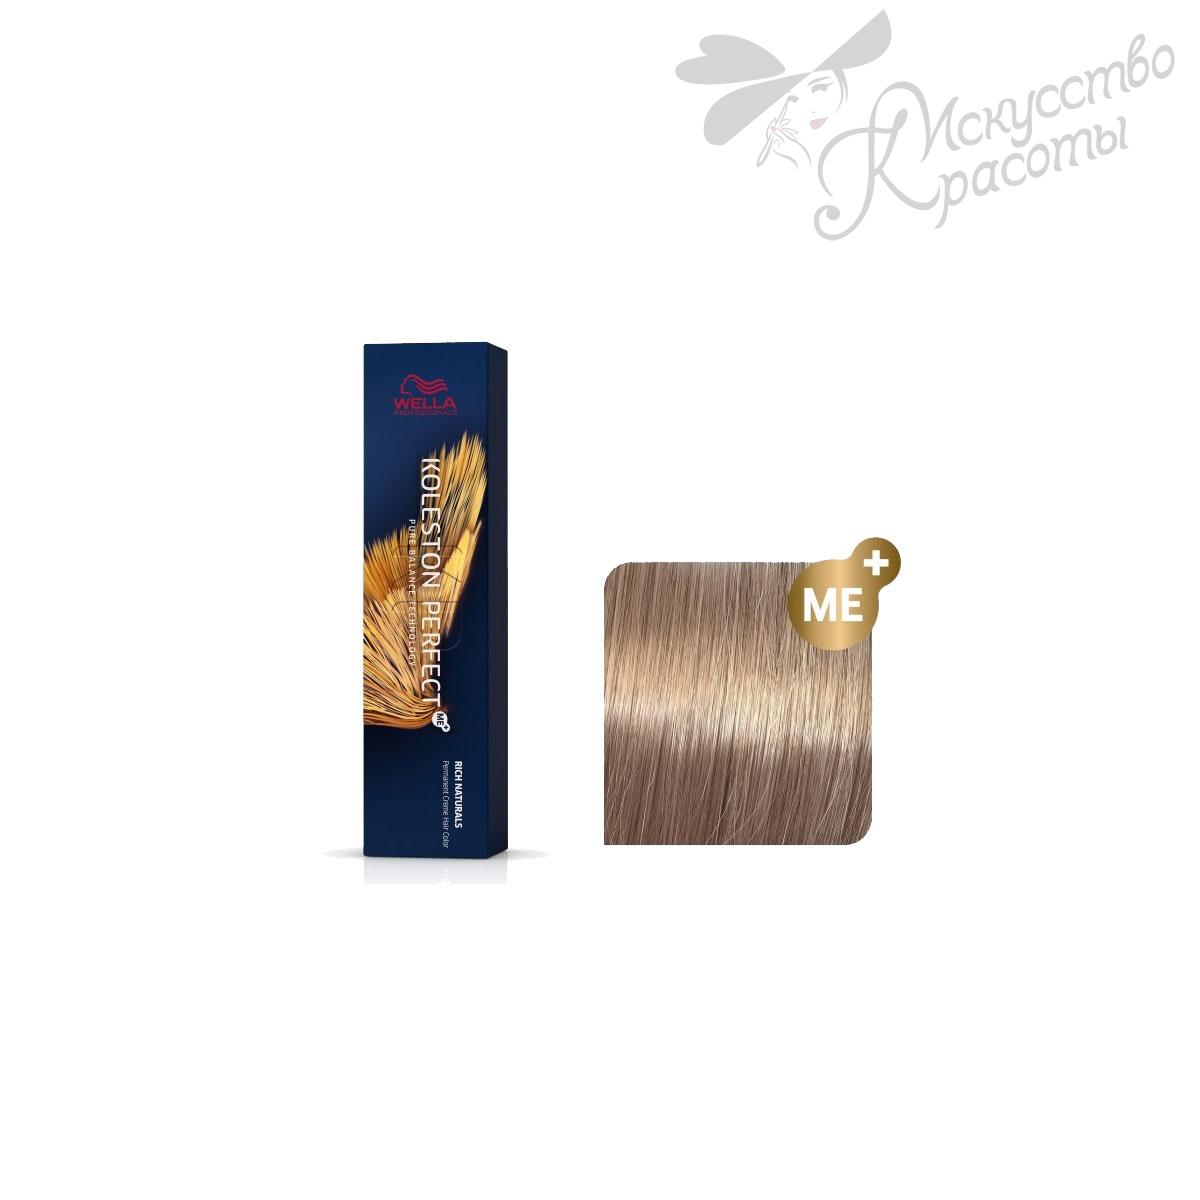 Wella Koleston 9/8 жемчужно-серебряный блондин 60 мл